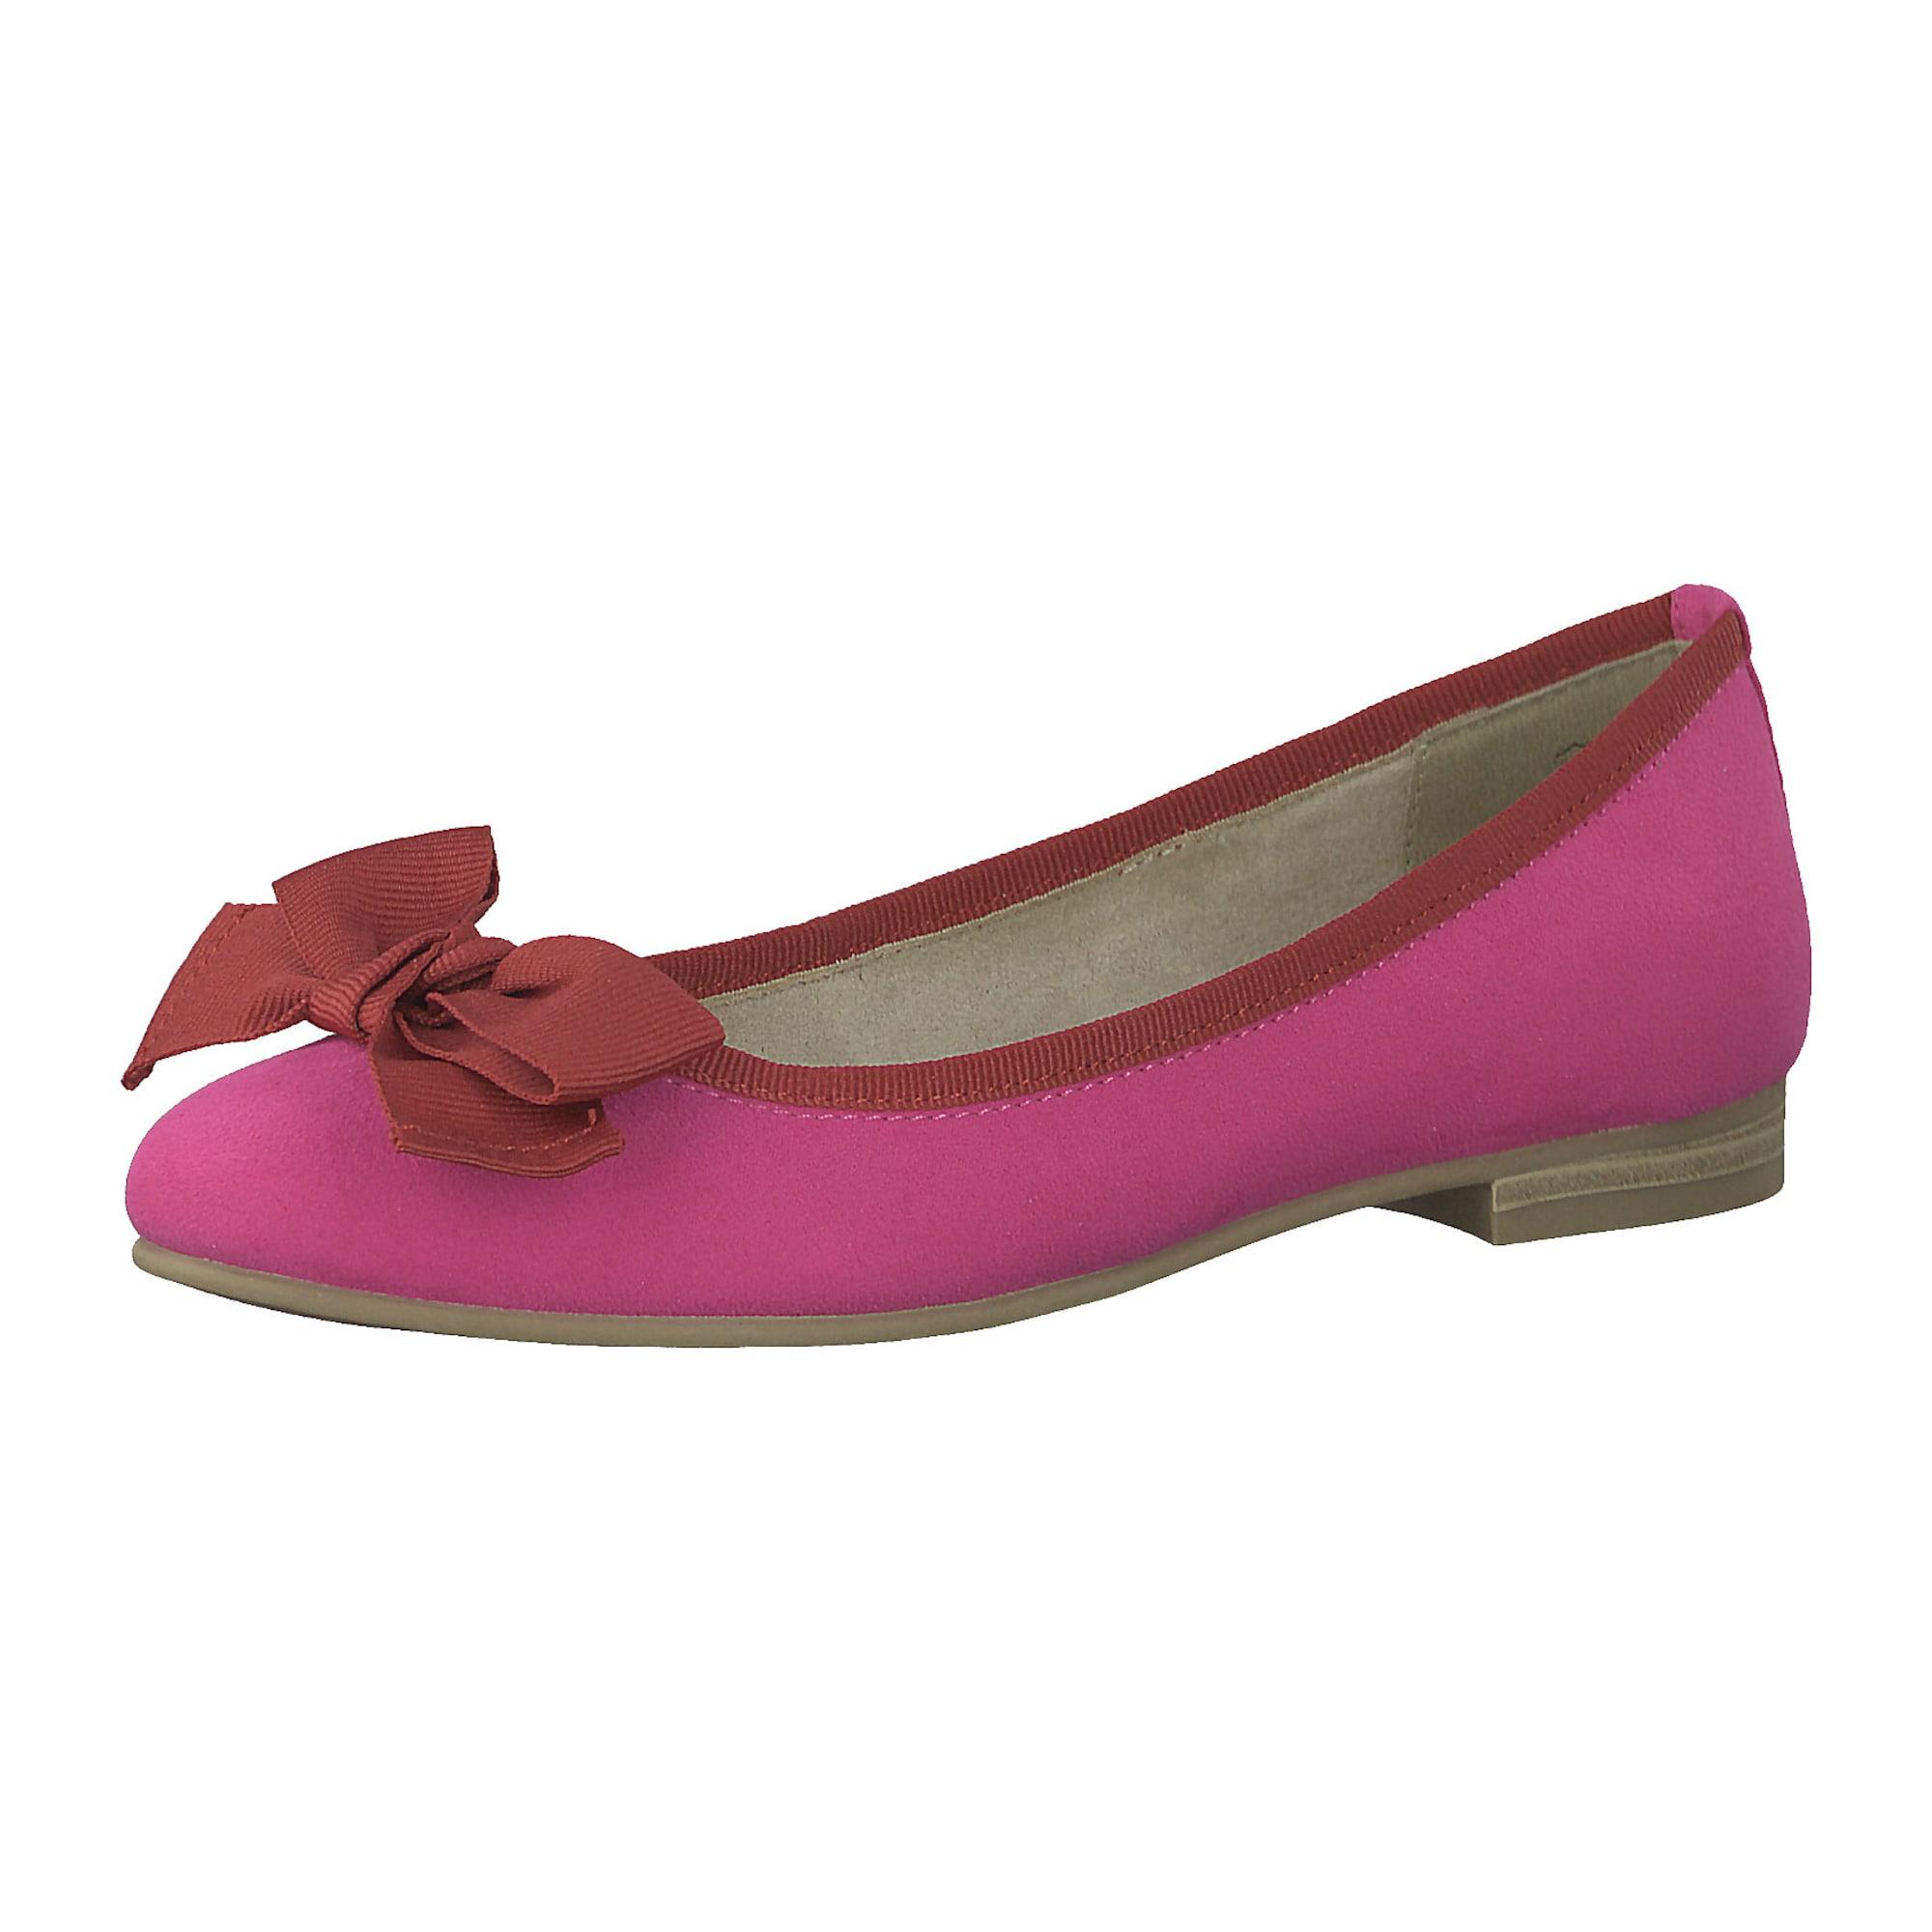 MARCO TOZZI, Dames Ballerina, eosine / pastelrood